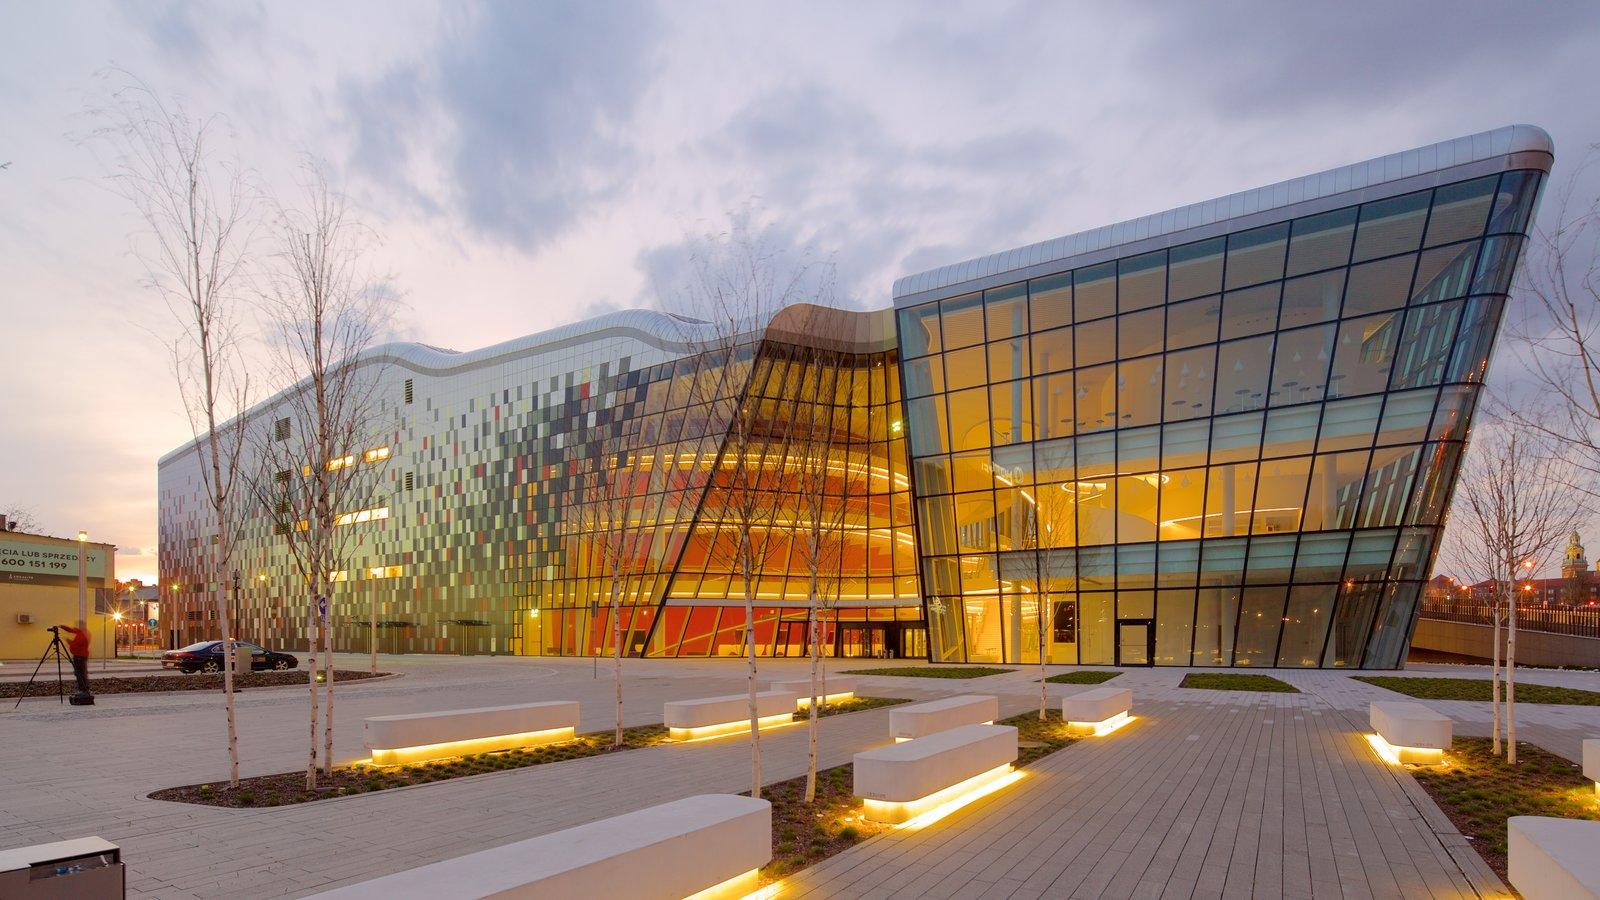 Cracovia que incluye arquitectura moderna